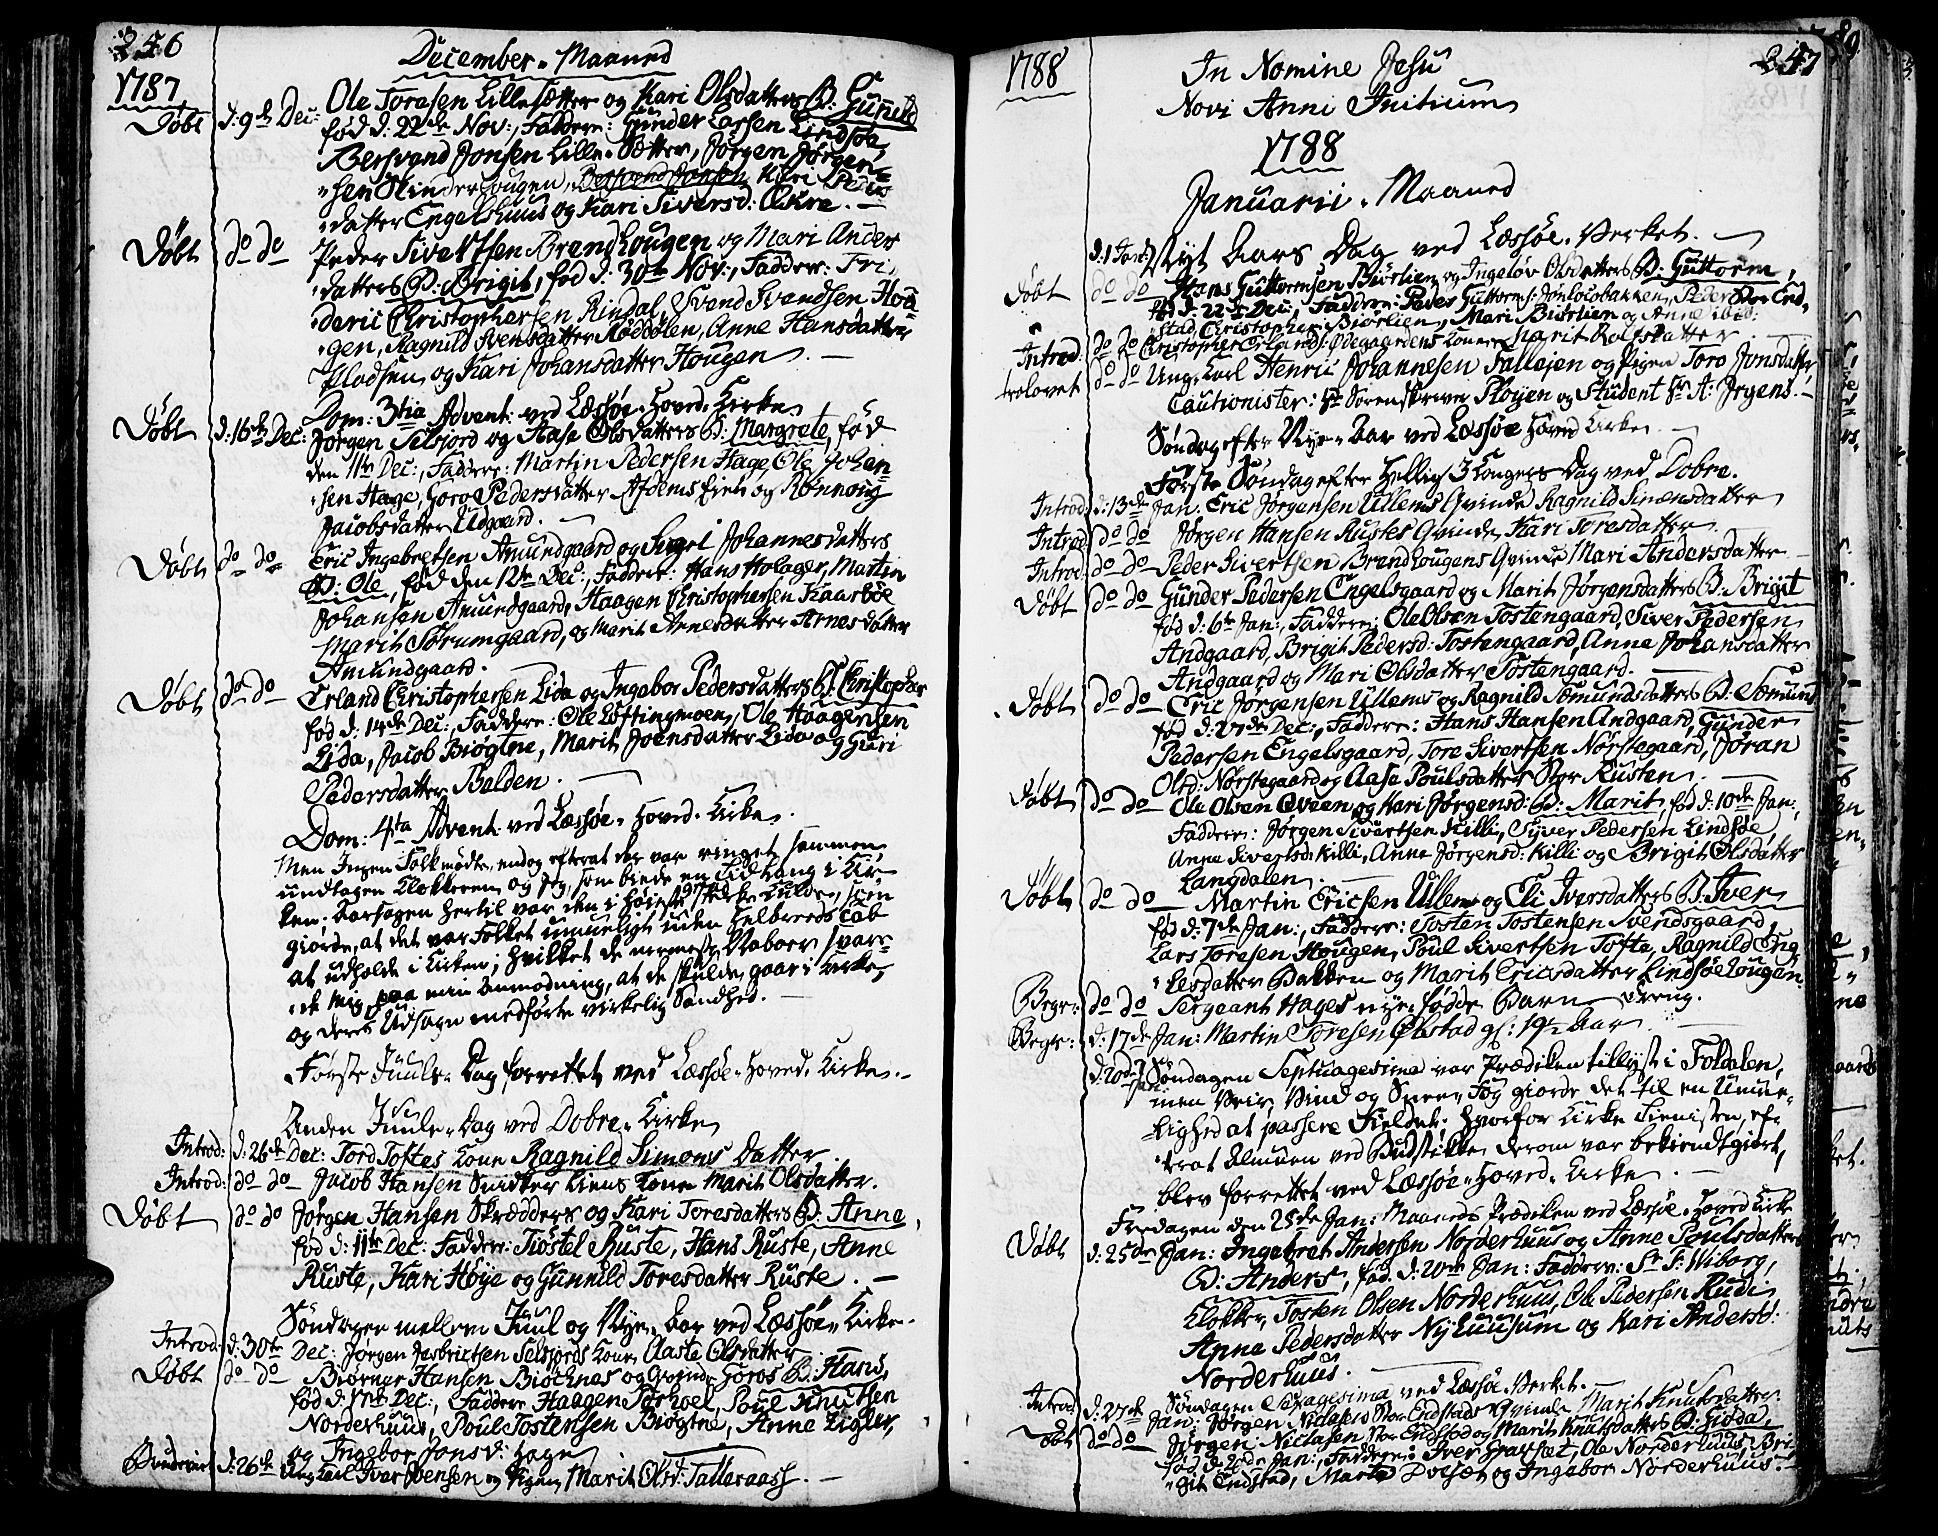 SAH, Lesja prestekontor, Ministerialbok nr. 3, 1777-1819, s. 246-247